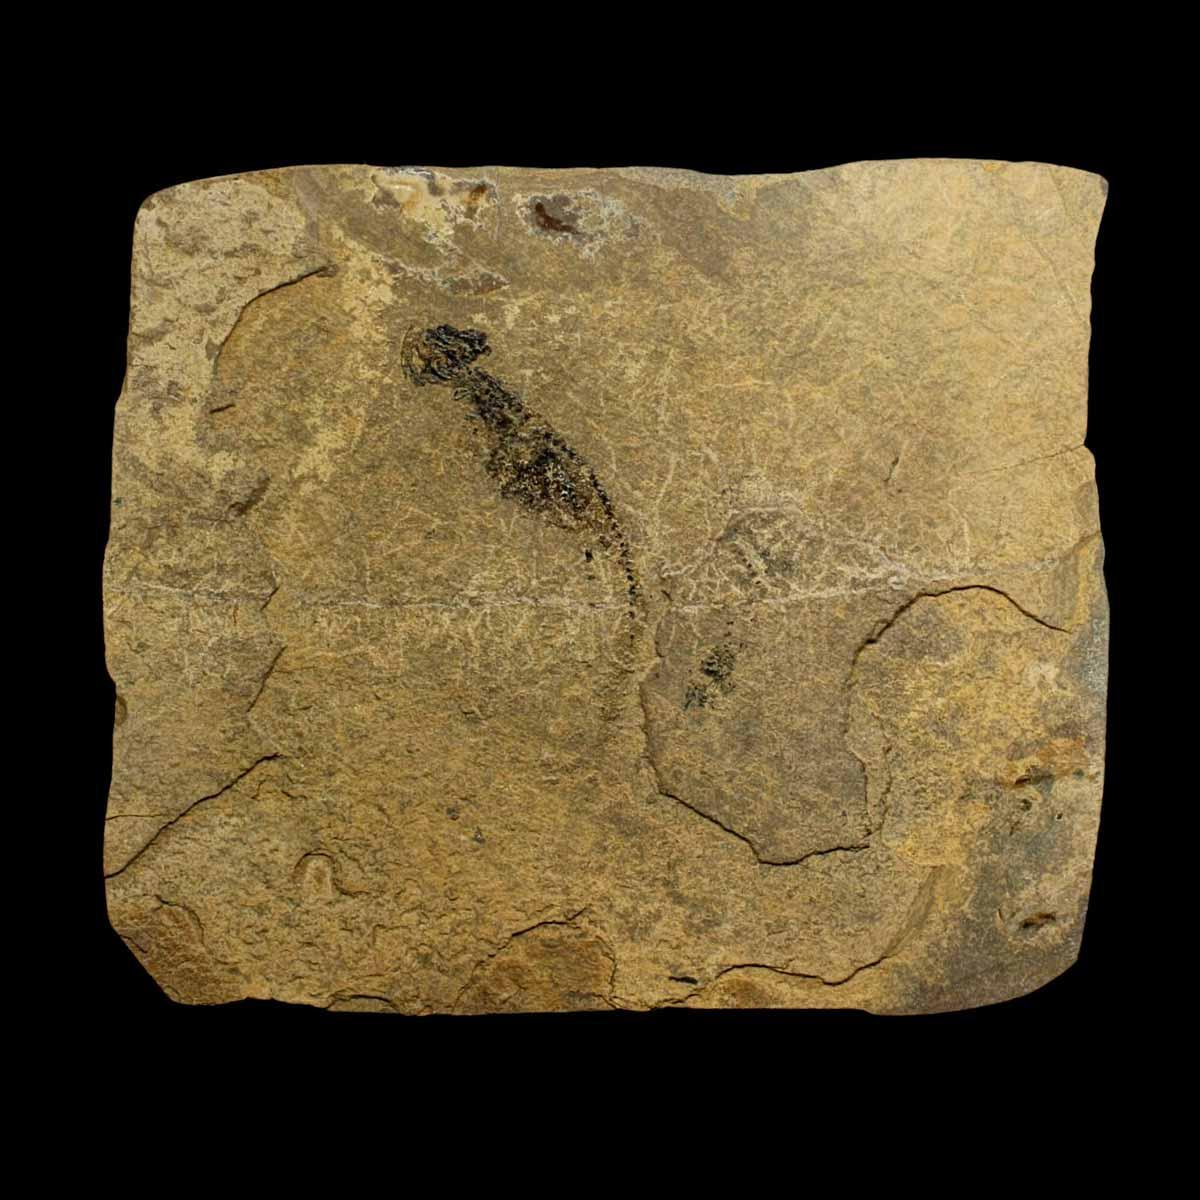 Branchiosaurus;Apateon pedistris